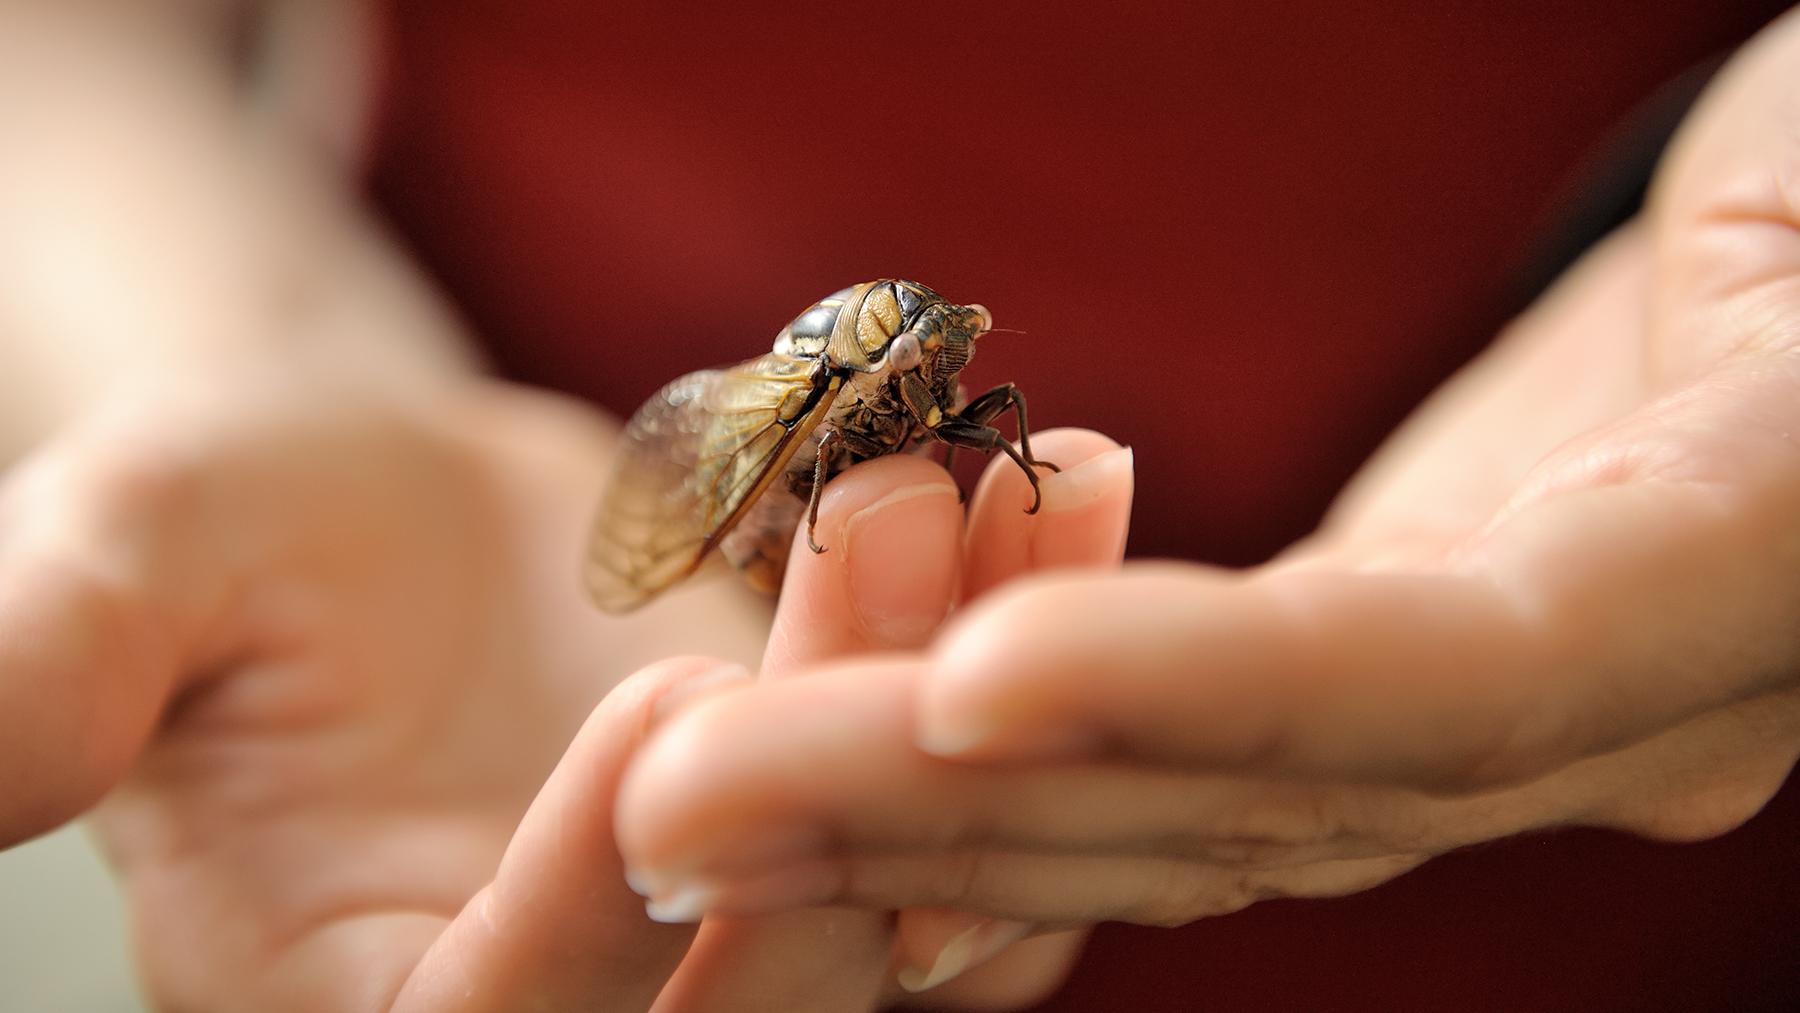 hands holding a cicada